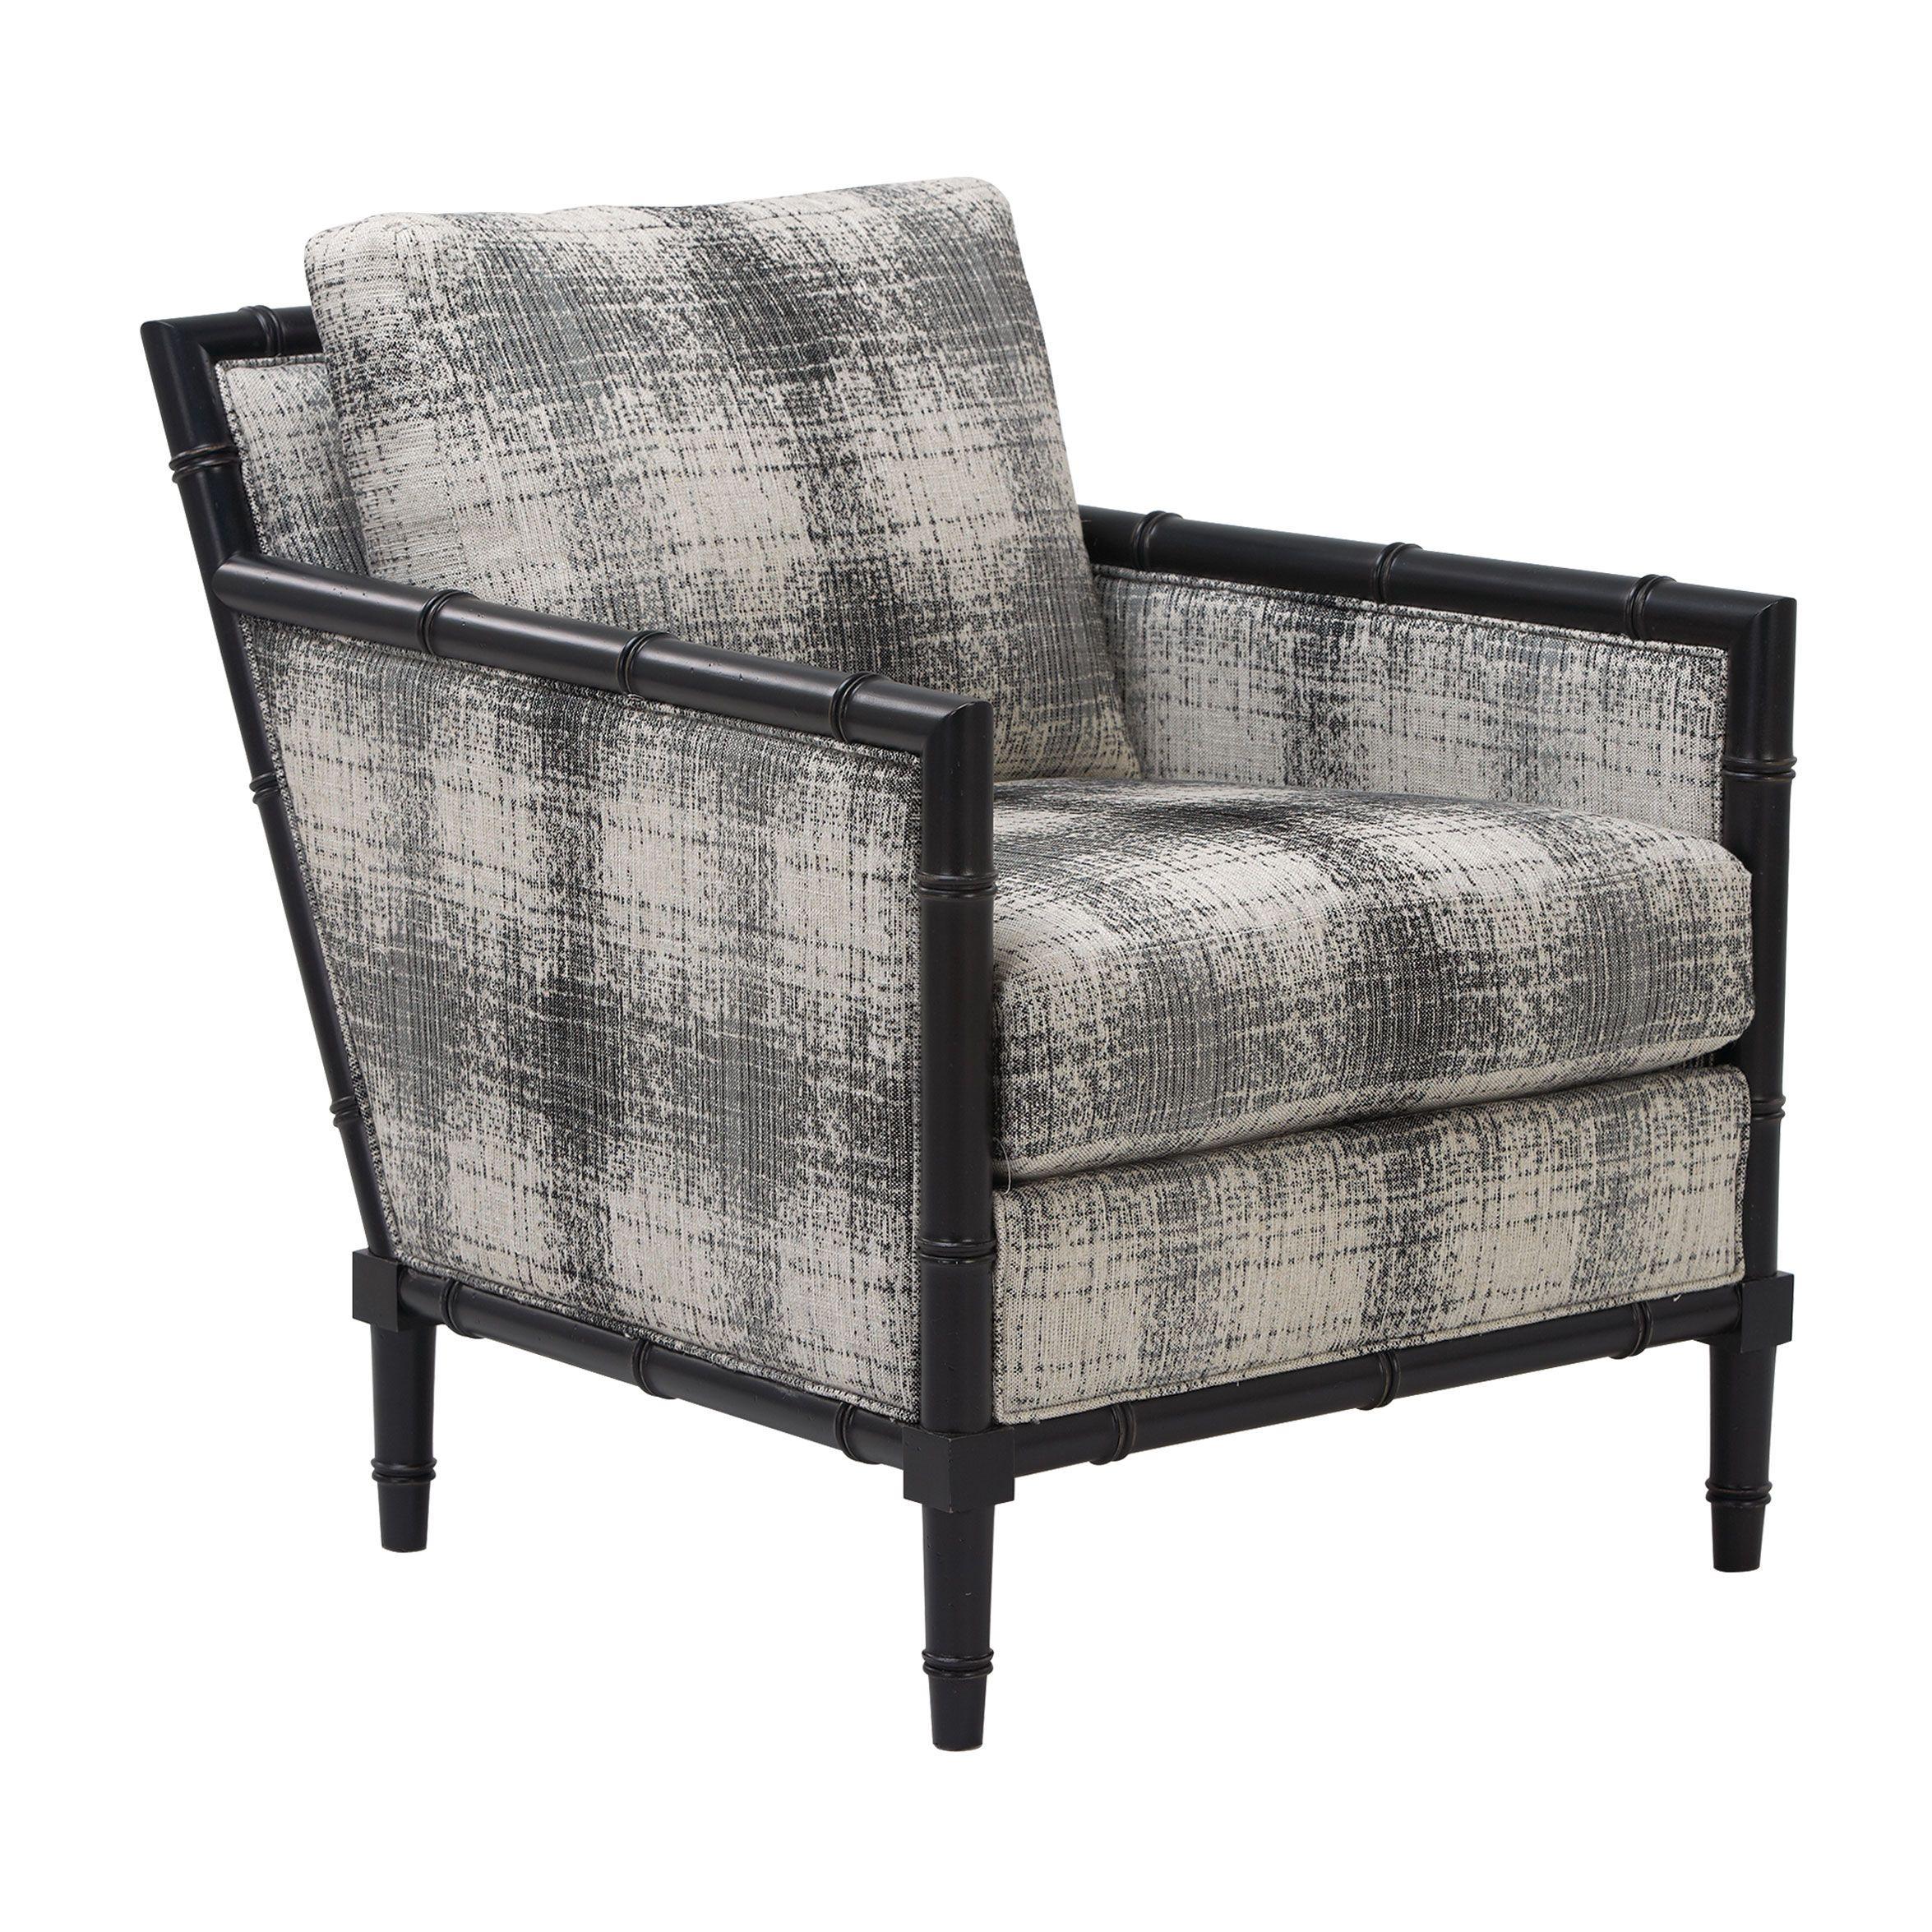 Black and white furniture Pierce Chair Ethan Allen US